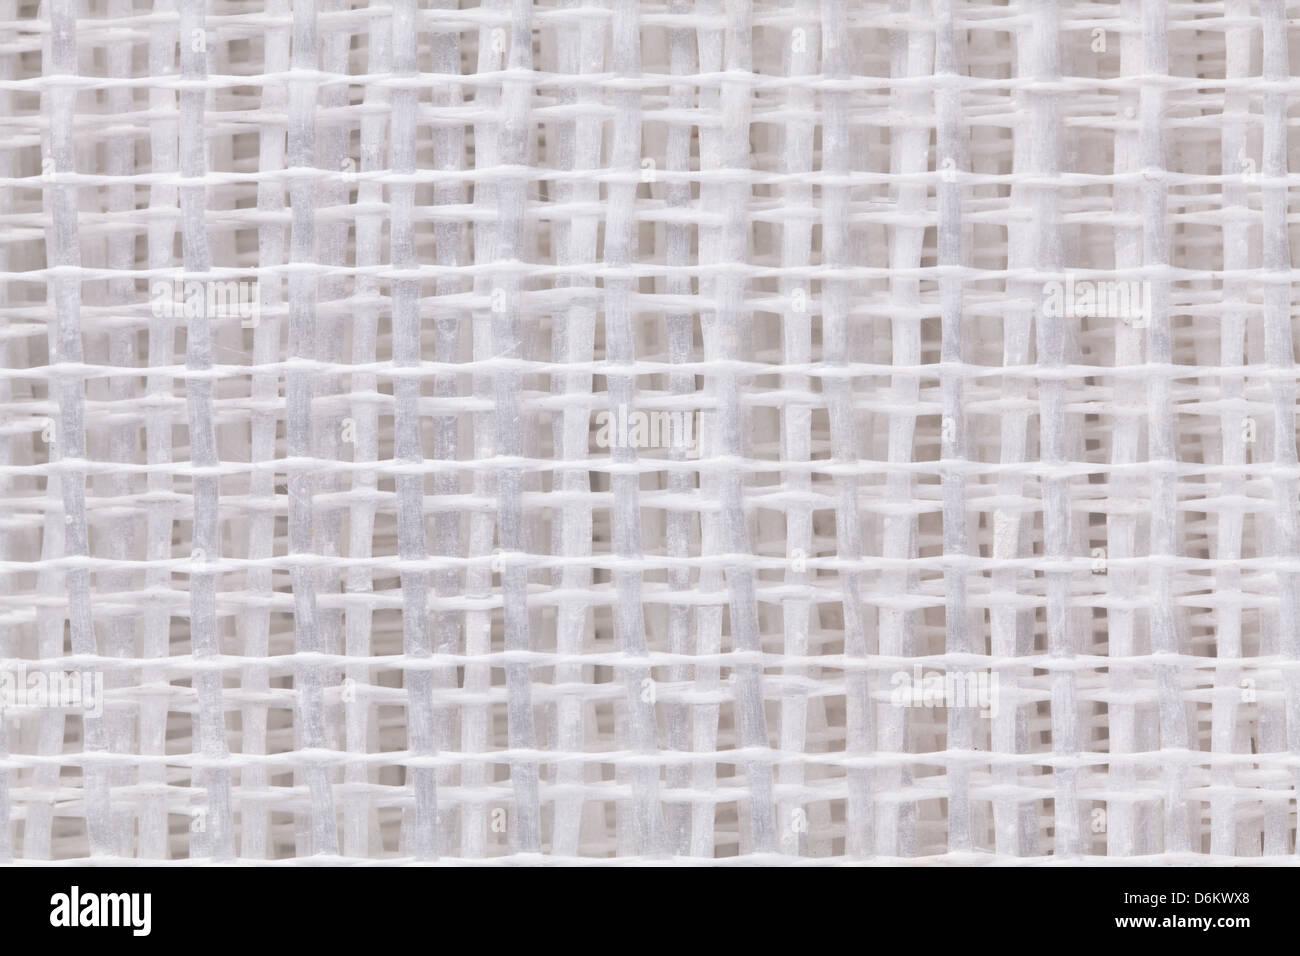 mesh glass-fiber insulation texture closeup - Stock Image